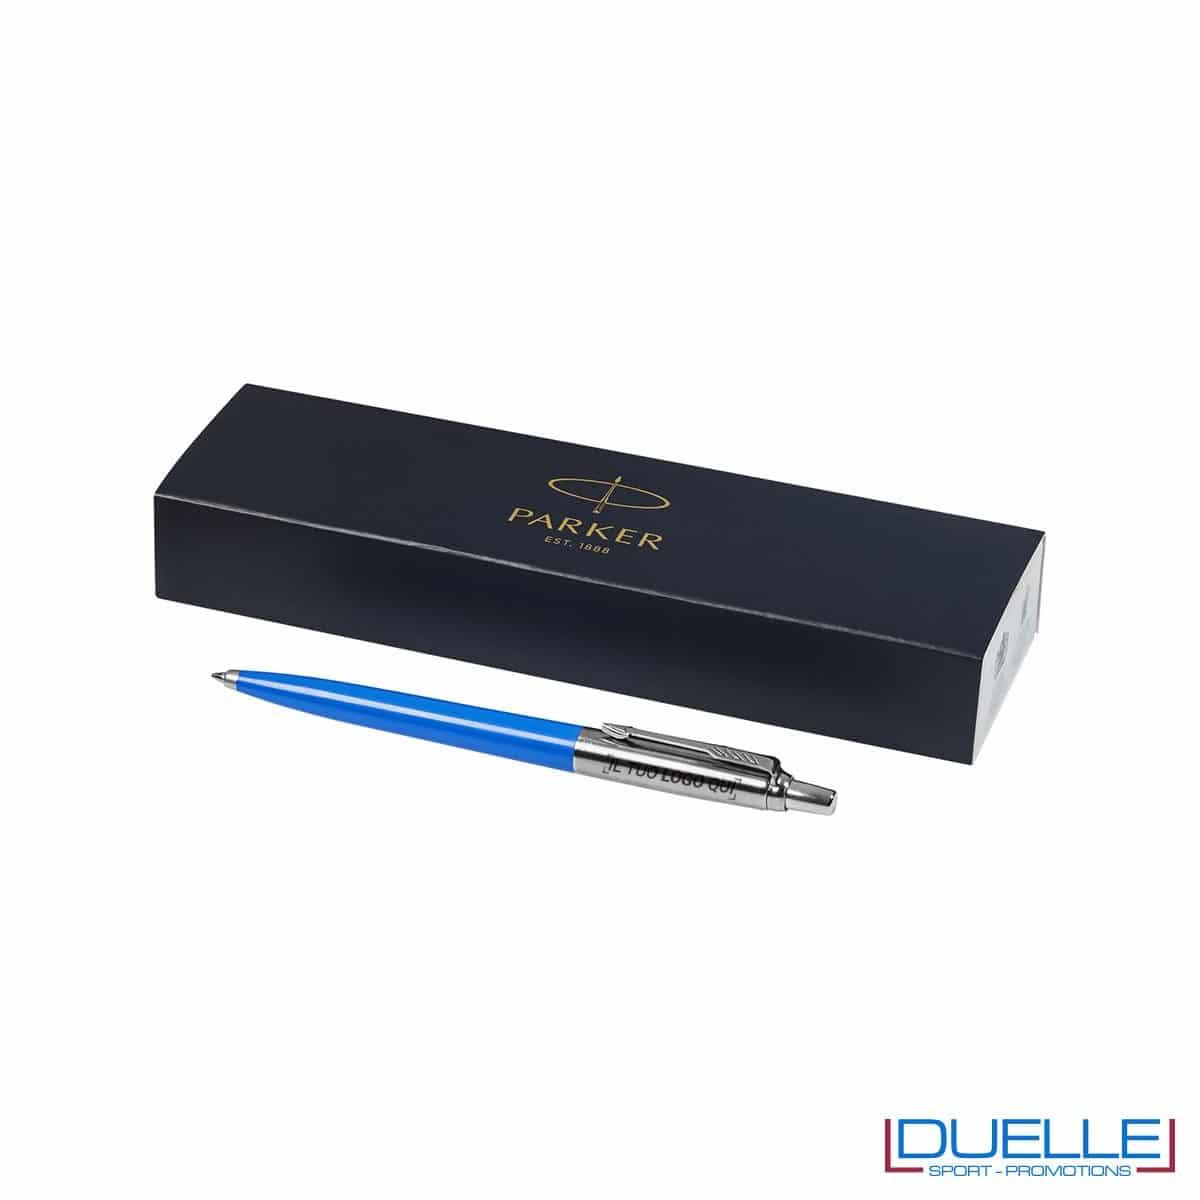 Penna Parker Jotter acciaio e plastica azzurra